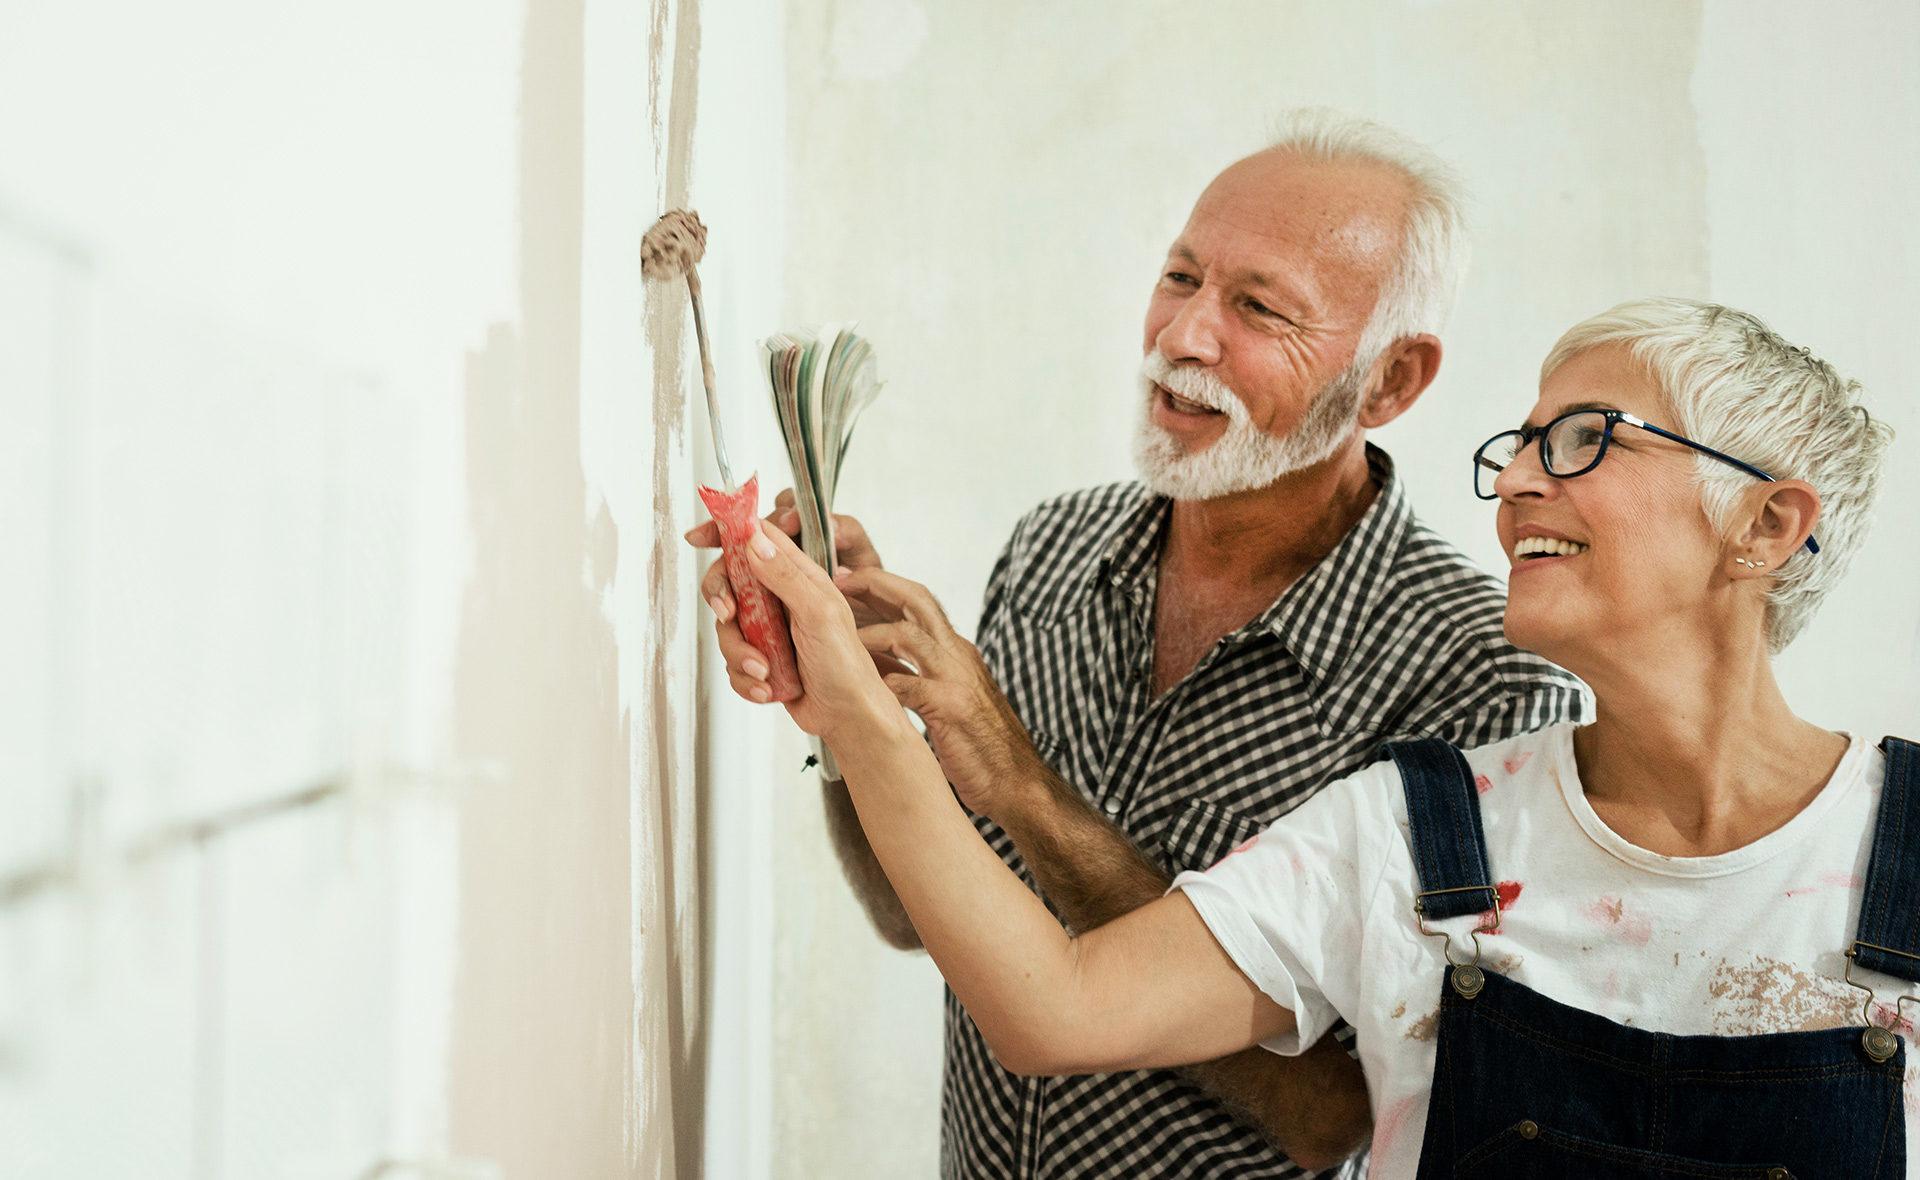 BBVA-Hipoteca-Inversa-jubilación-hogar-adultos-pareja-retiro-casa